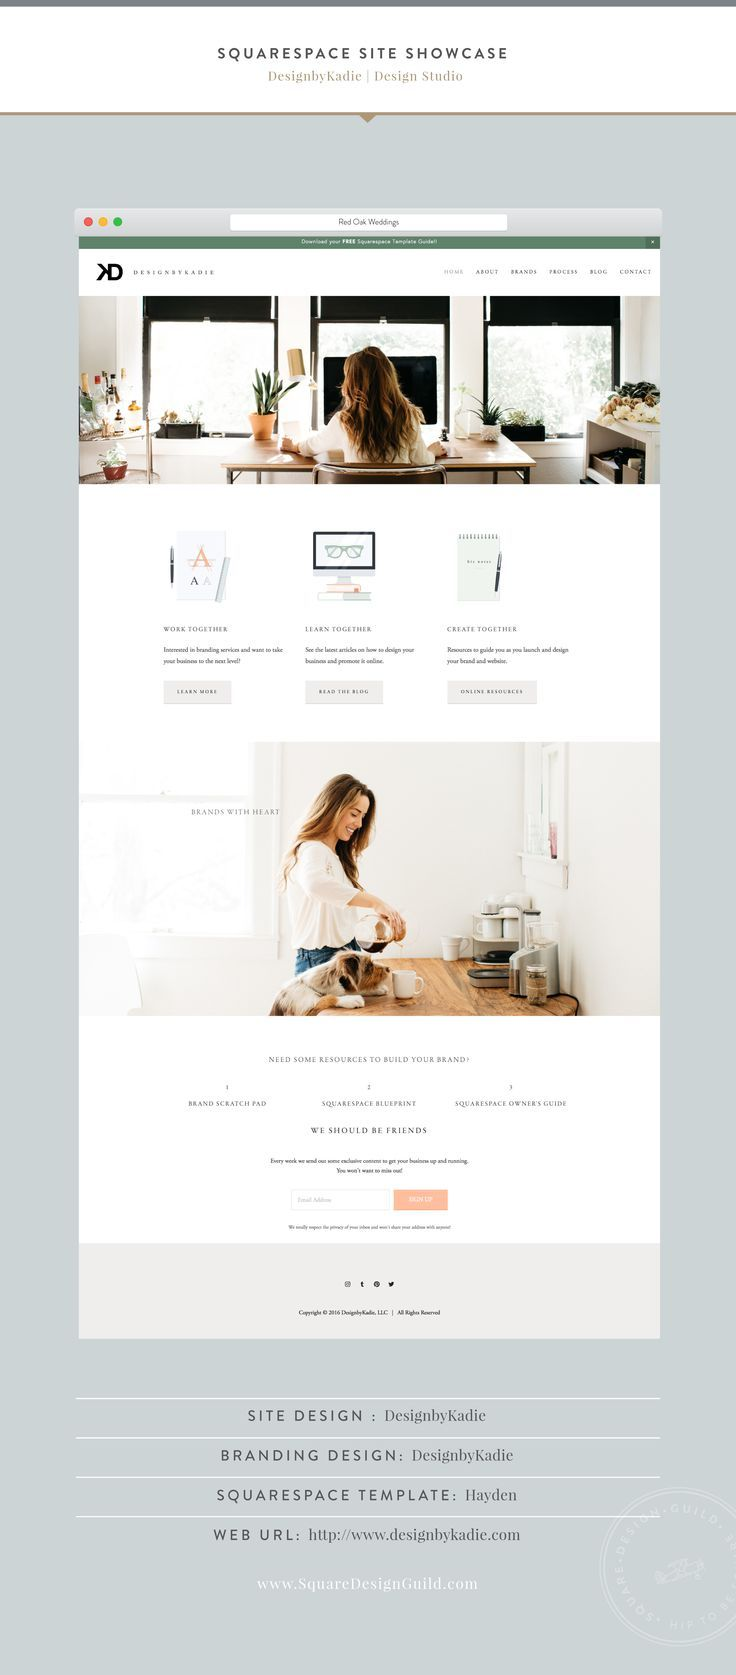 Site Showcase Designbykadie Simple Website Design Squarespace Design Webpage Design